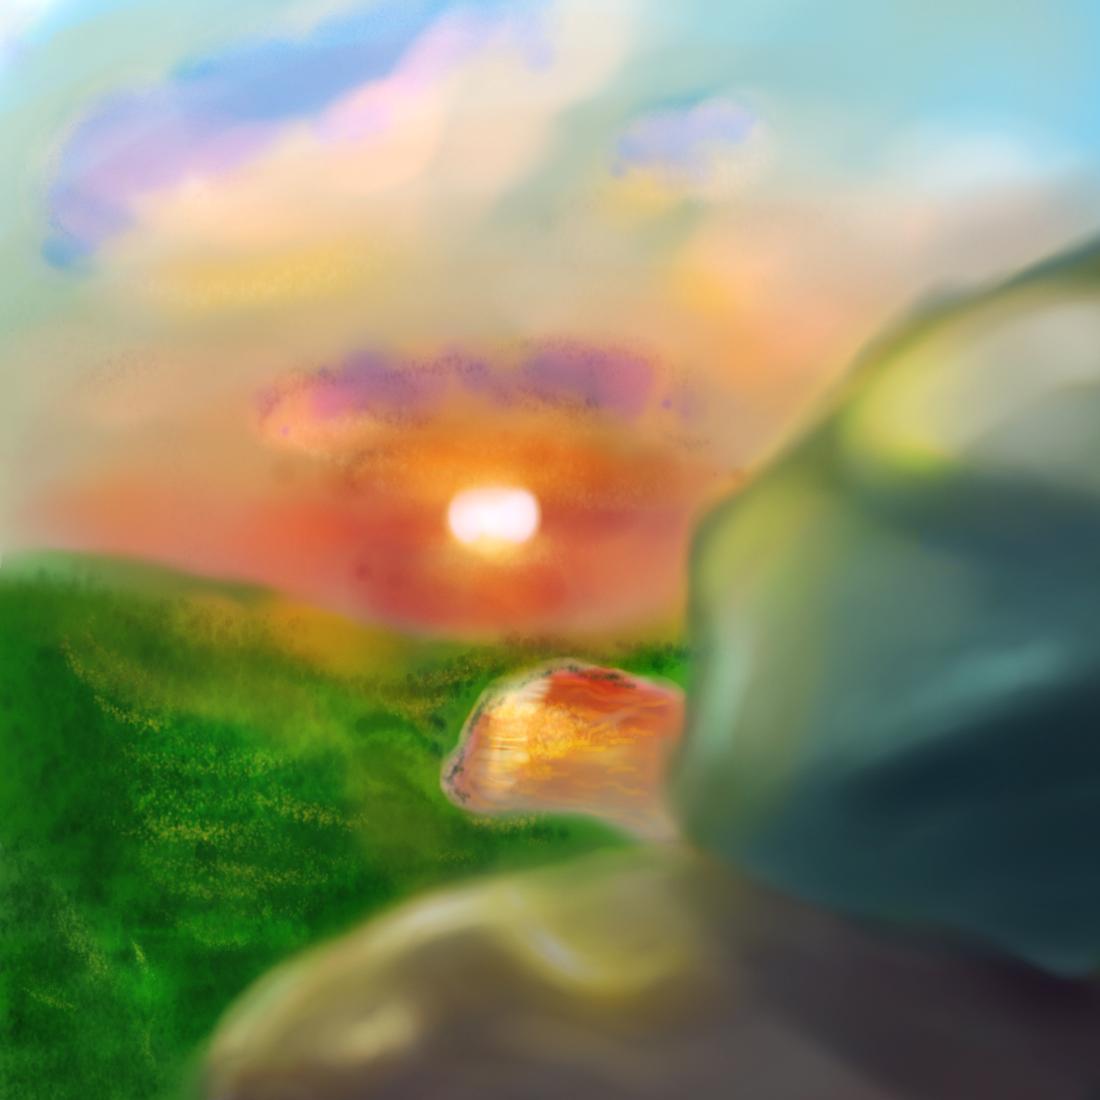 sunset_by_nitrol_pl-d8tddot.png